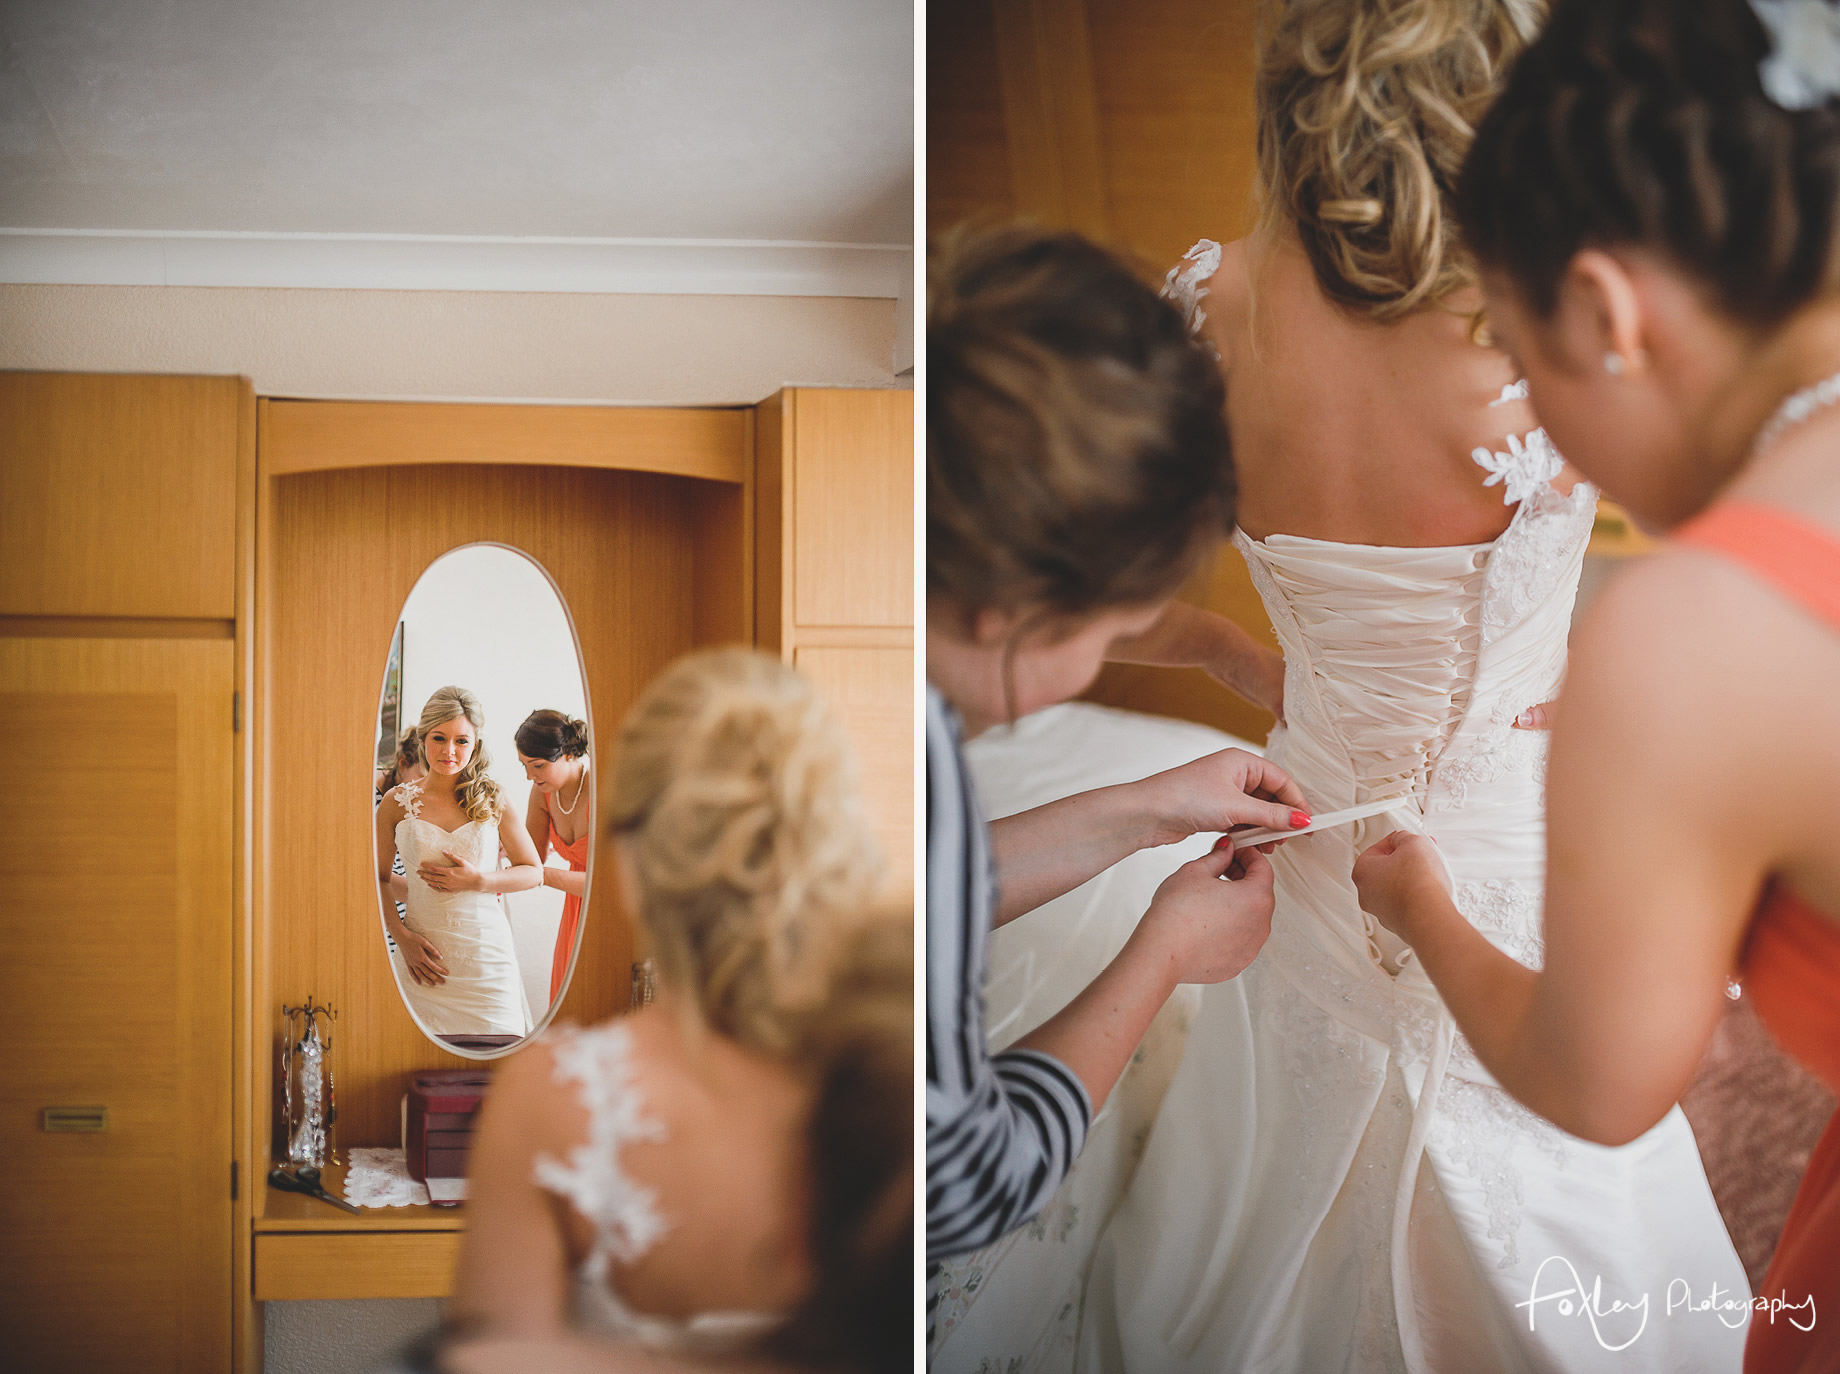 Gemma and Lewis' Wedding at Mitton Hall 036